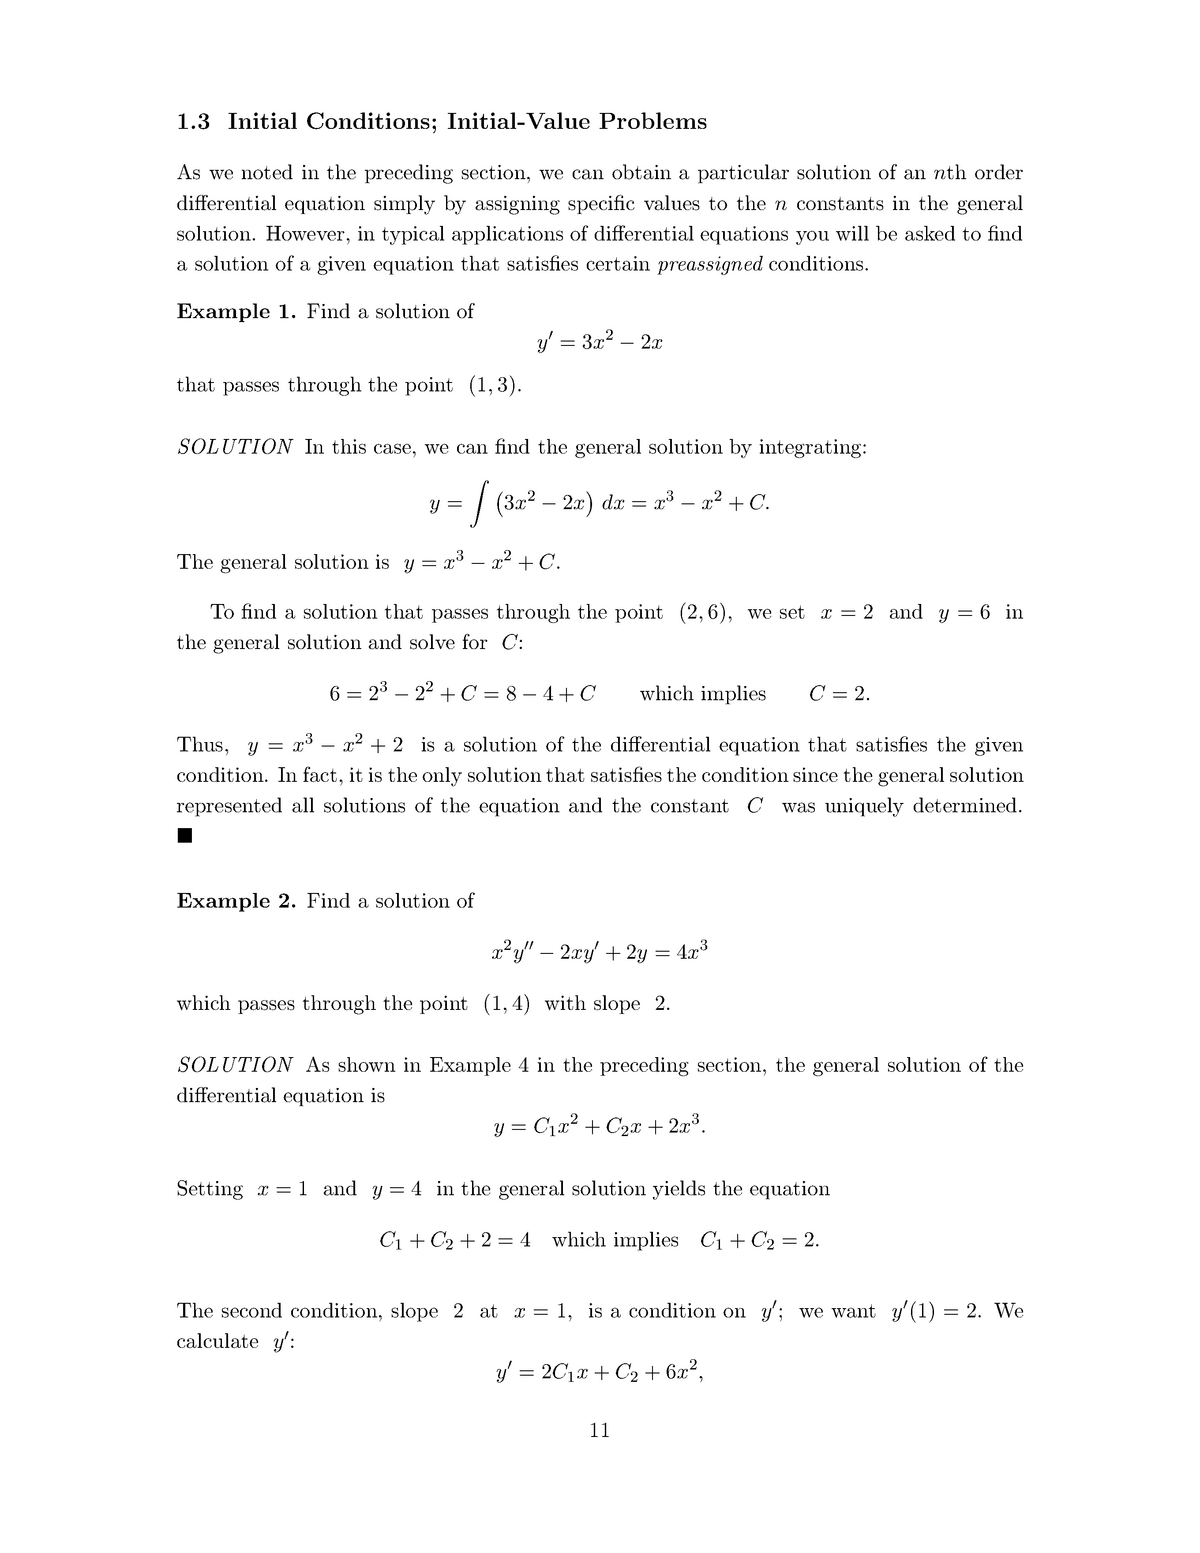 Initial Value Problems - MATH25600001: Engineer Math IV